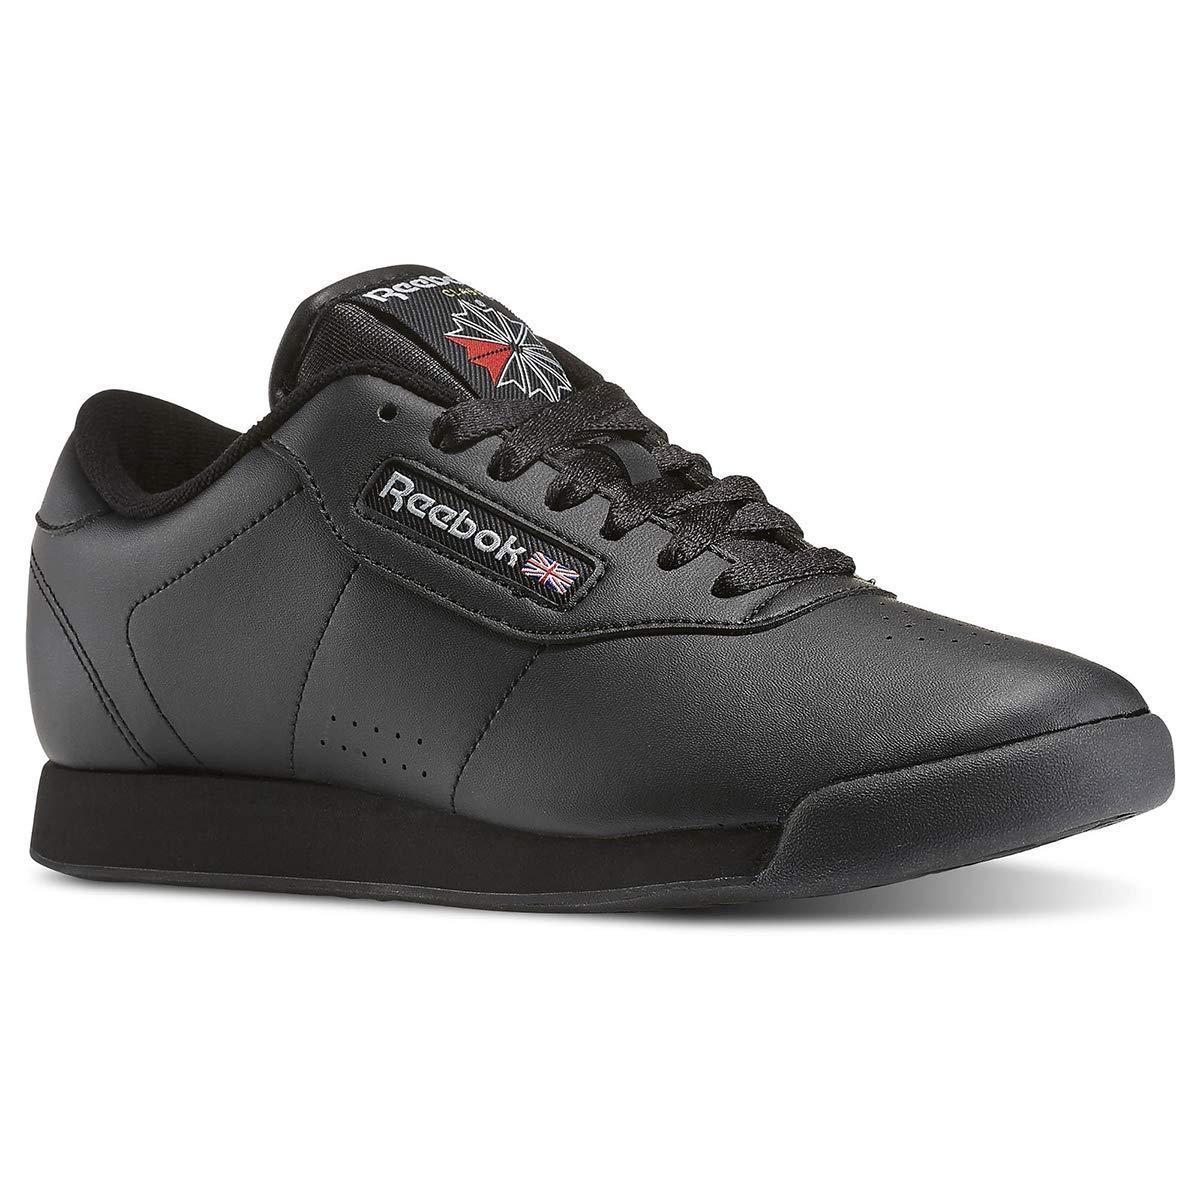 f4d0da0414c0 Amazon.com  Reebok Women s Princess Sneaker  Reebok  Shoes